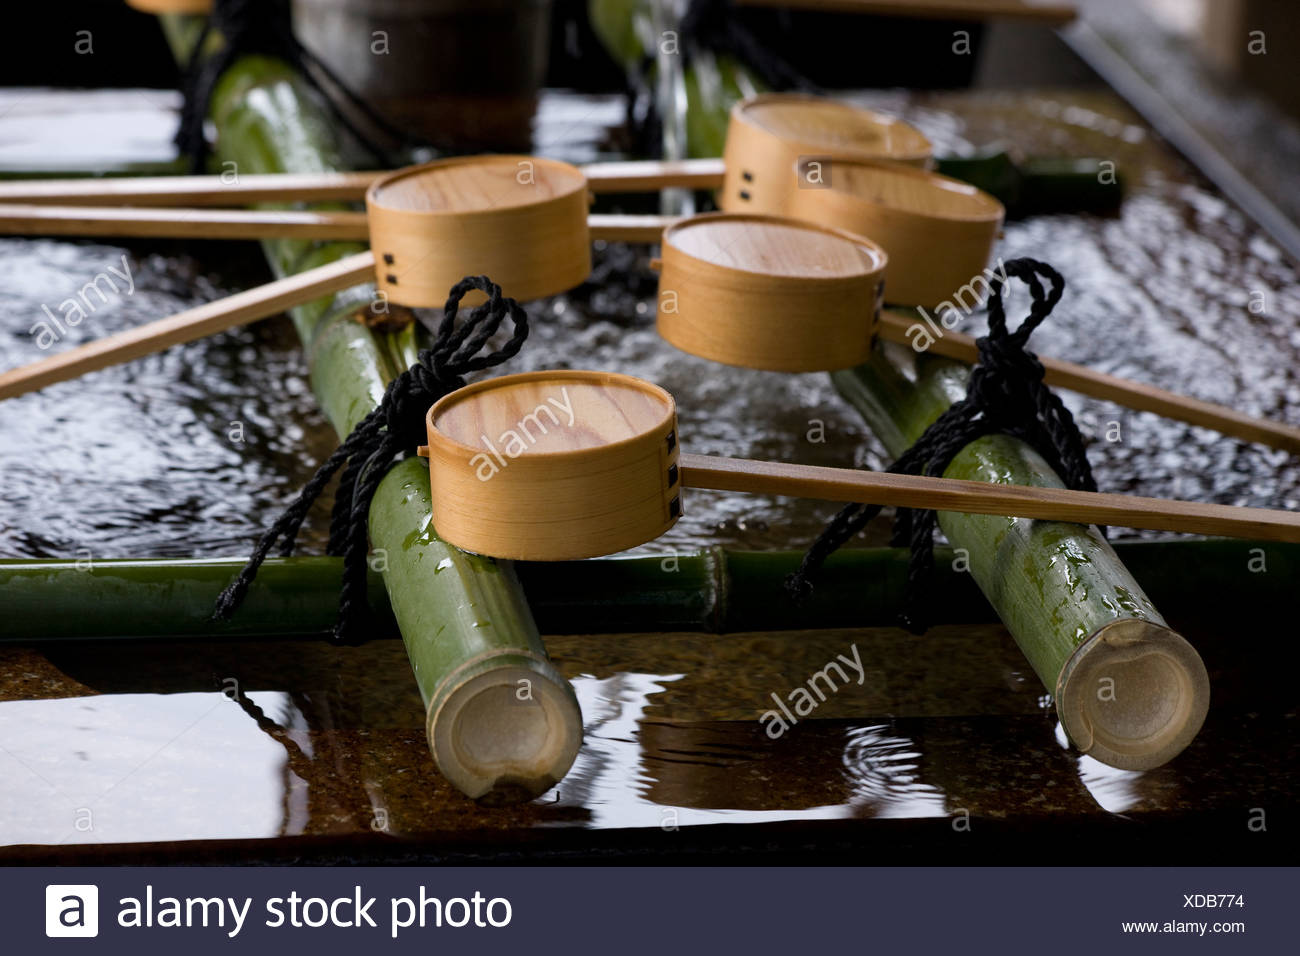 Ceremonial hand washing ladles - Stock Image